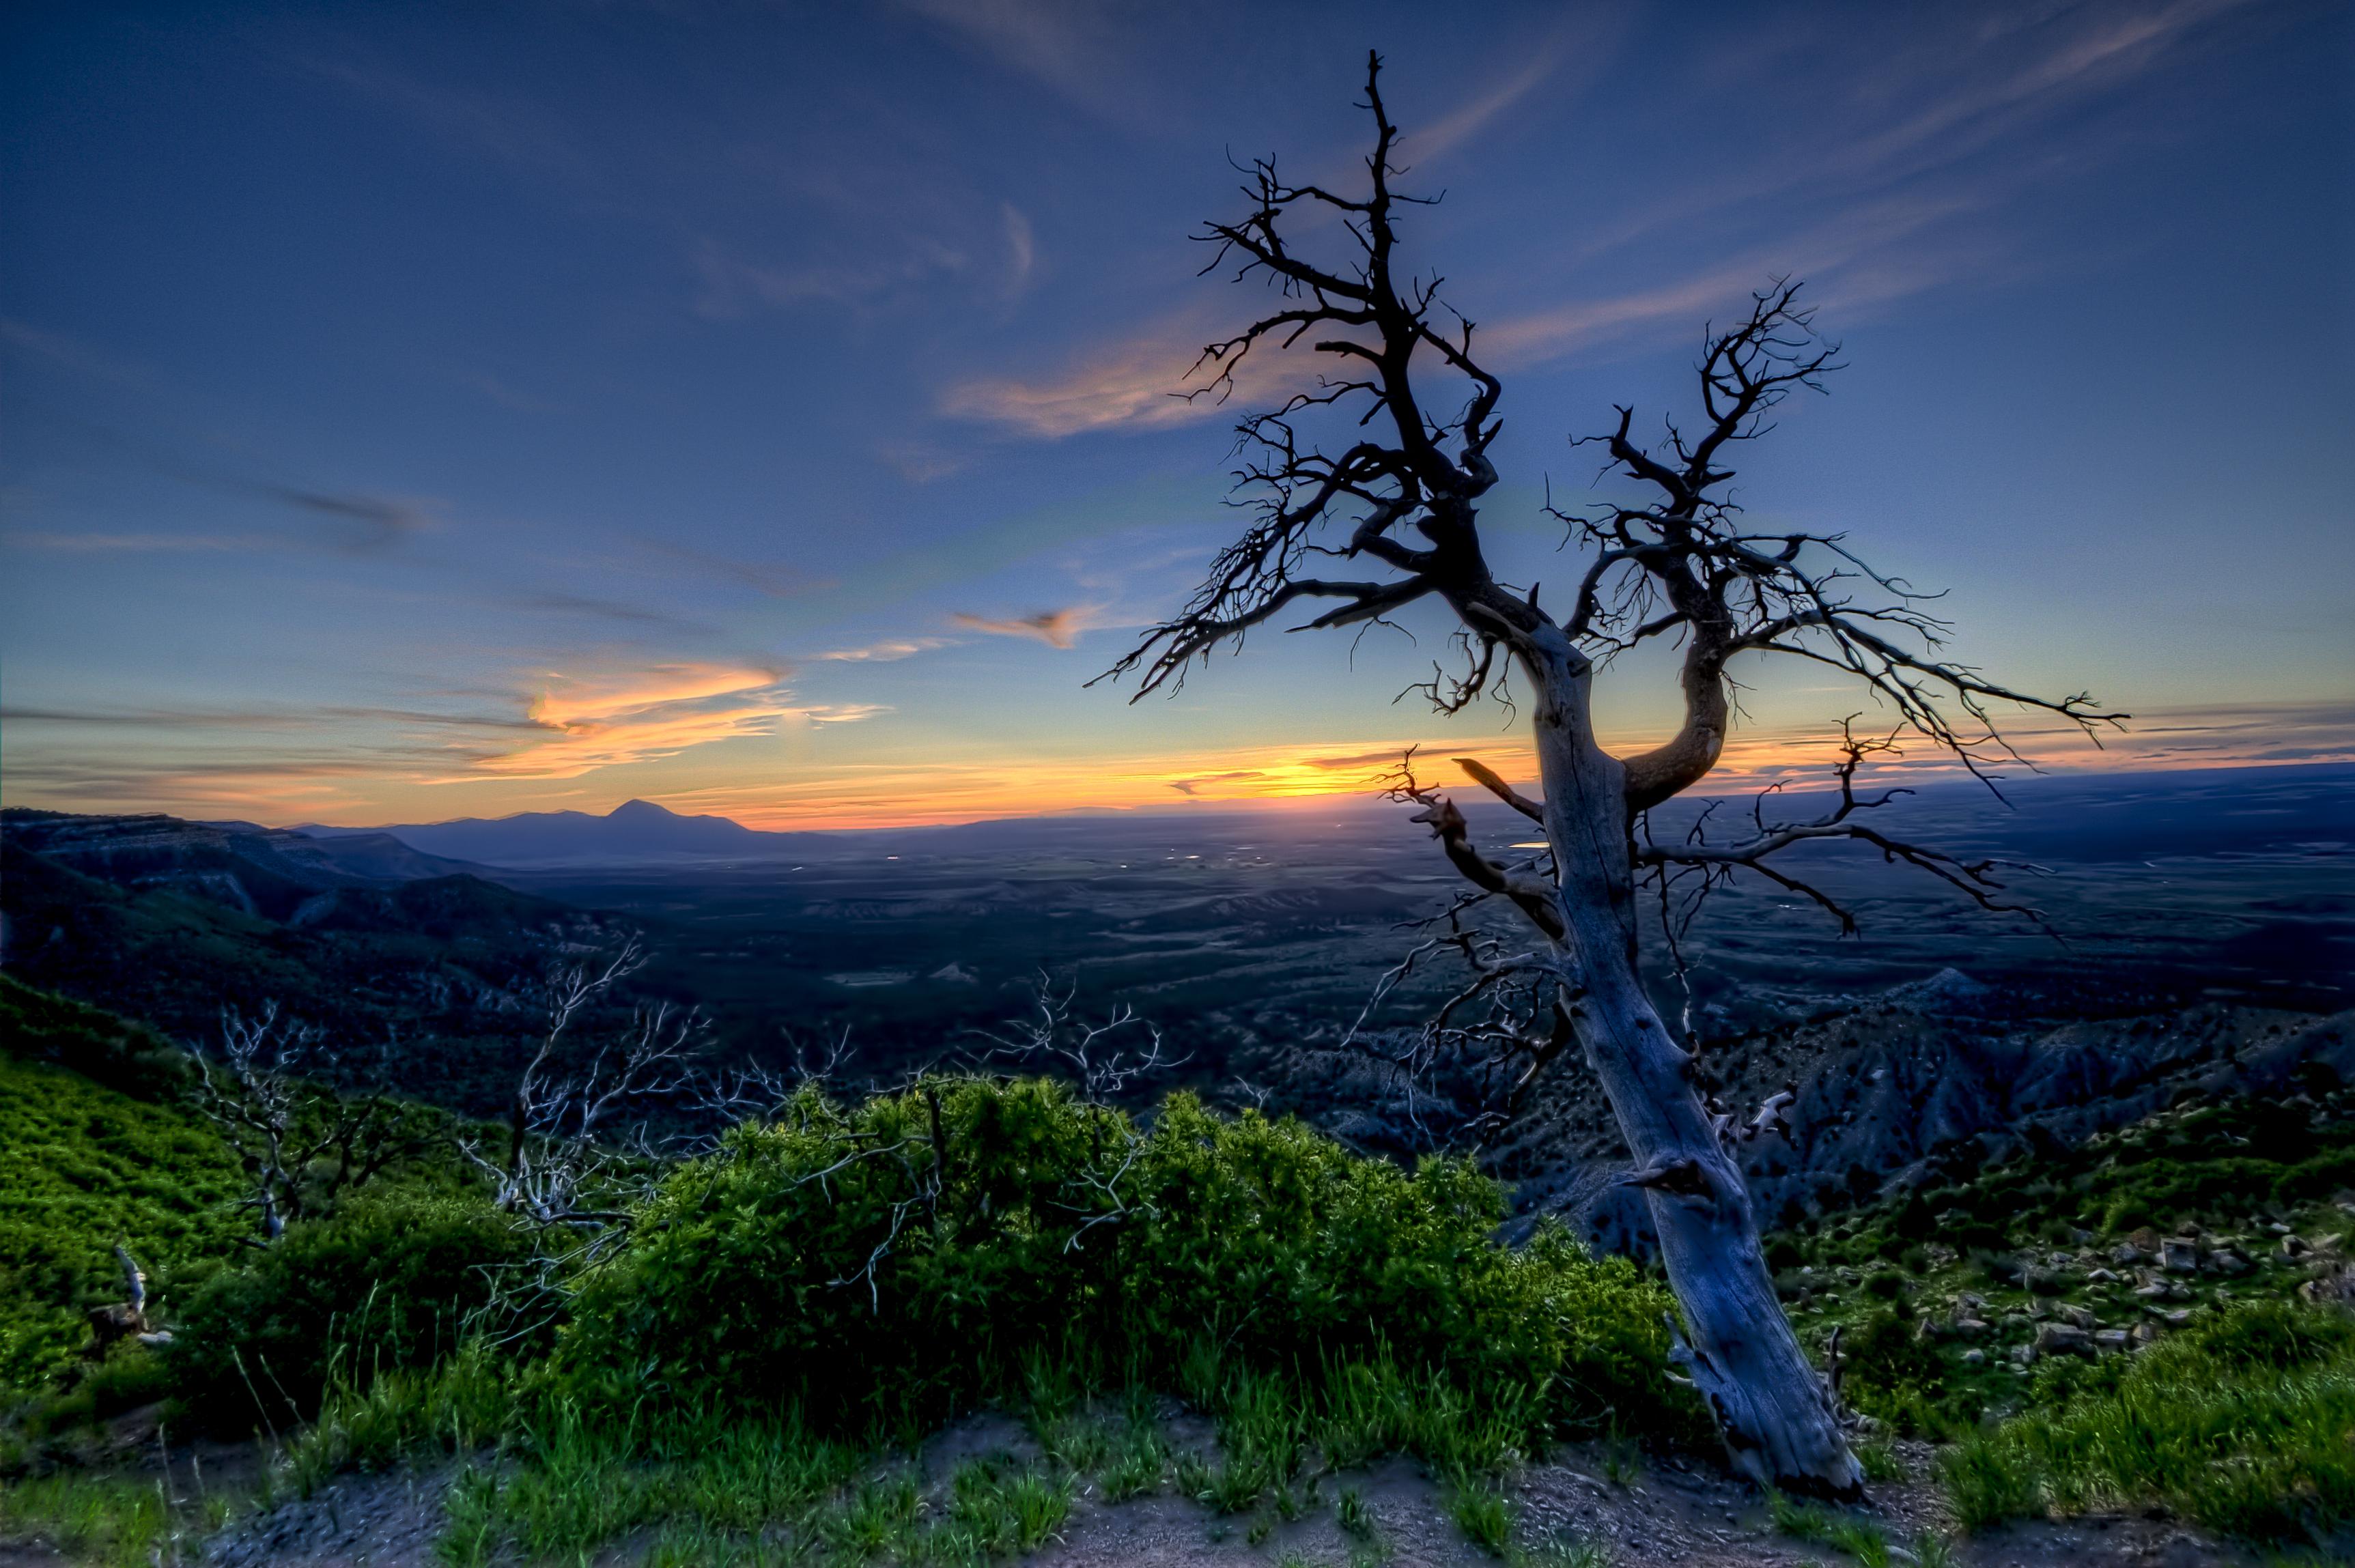 Sunset in Mesa Verde